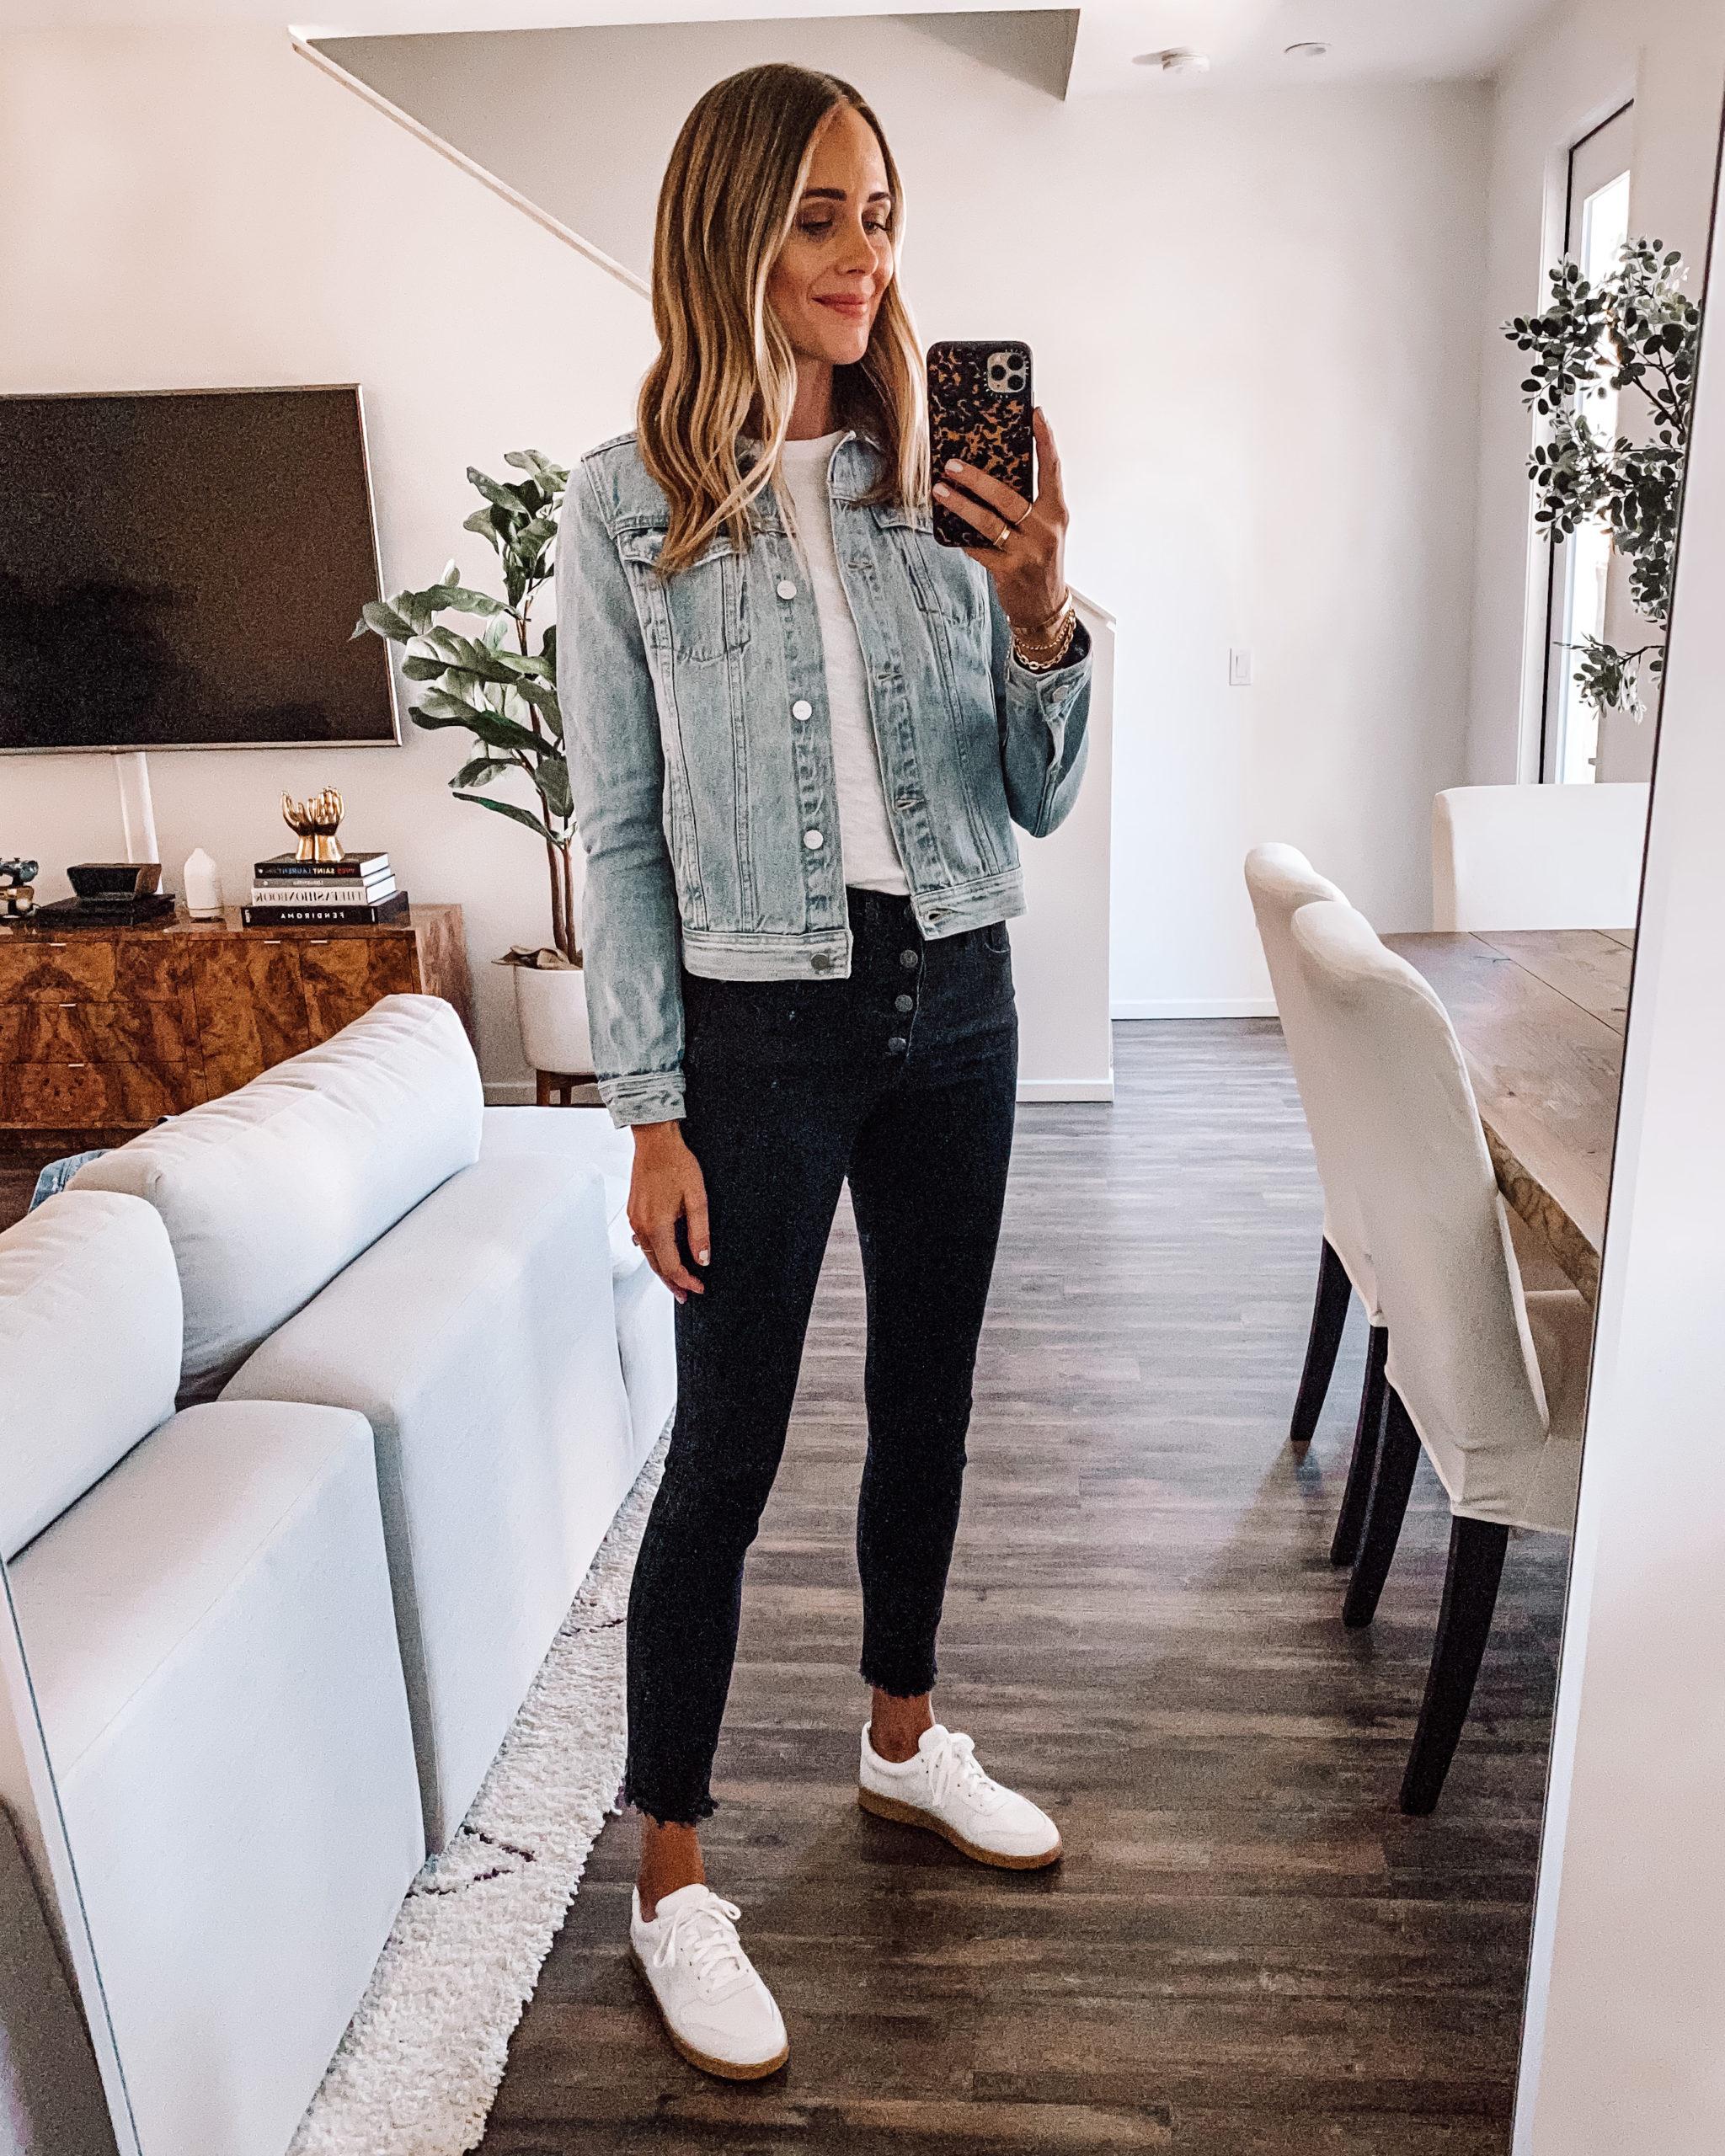 Fashion Jackson Wearing Joes Jeans Light Wash Denim Jacket White Tshirt Black Skinny Jeans Everlane White Sneakers